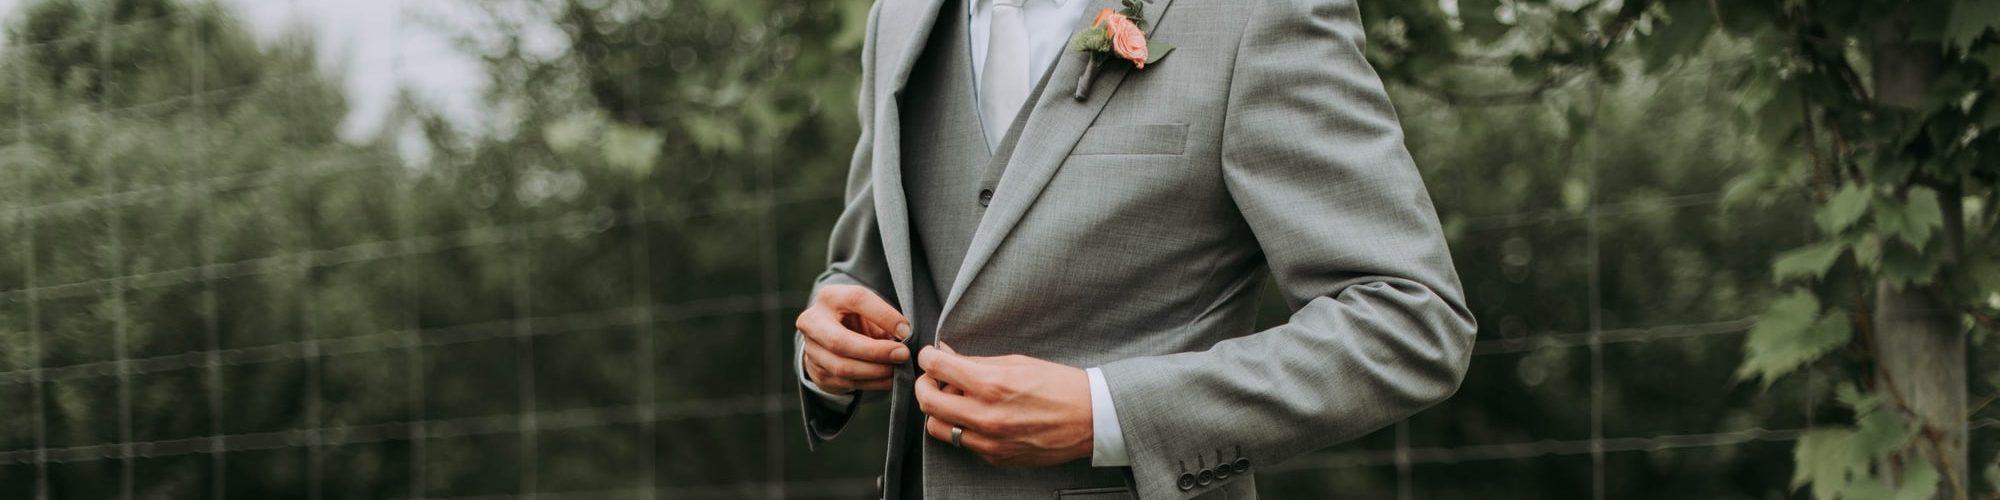 licht-grijs-groen-trouwpak